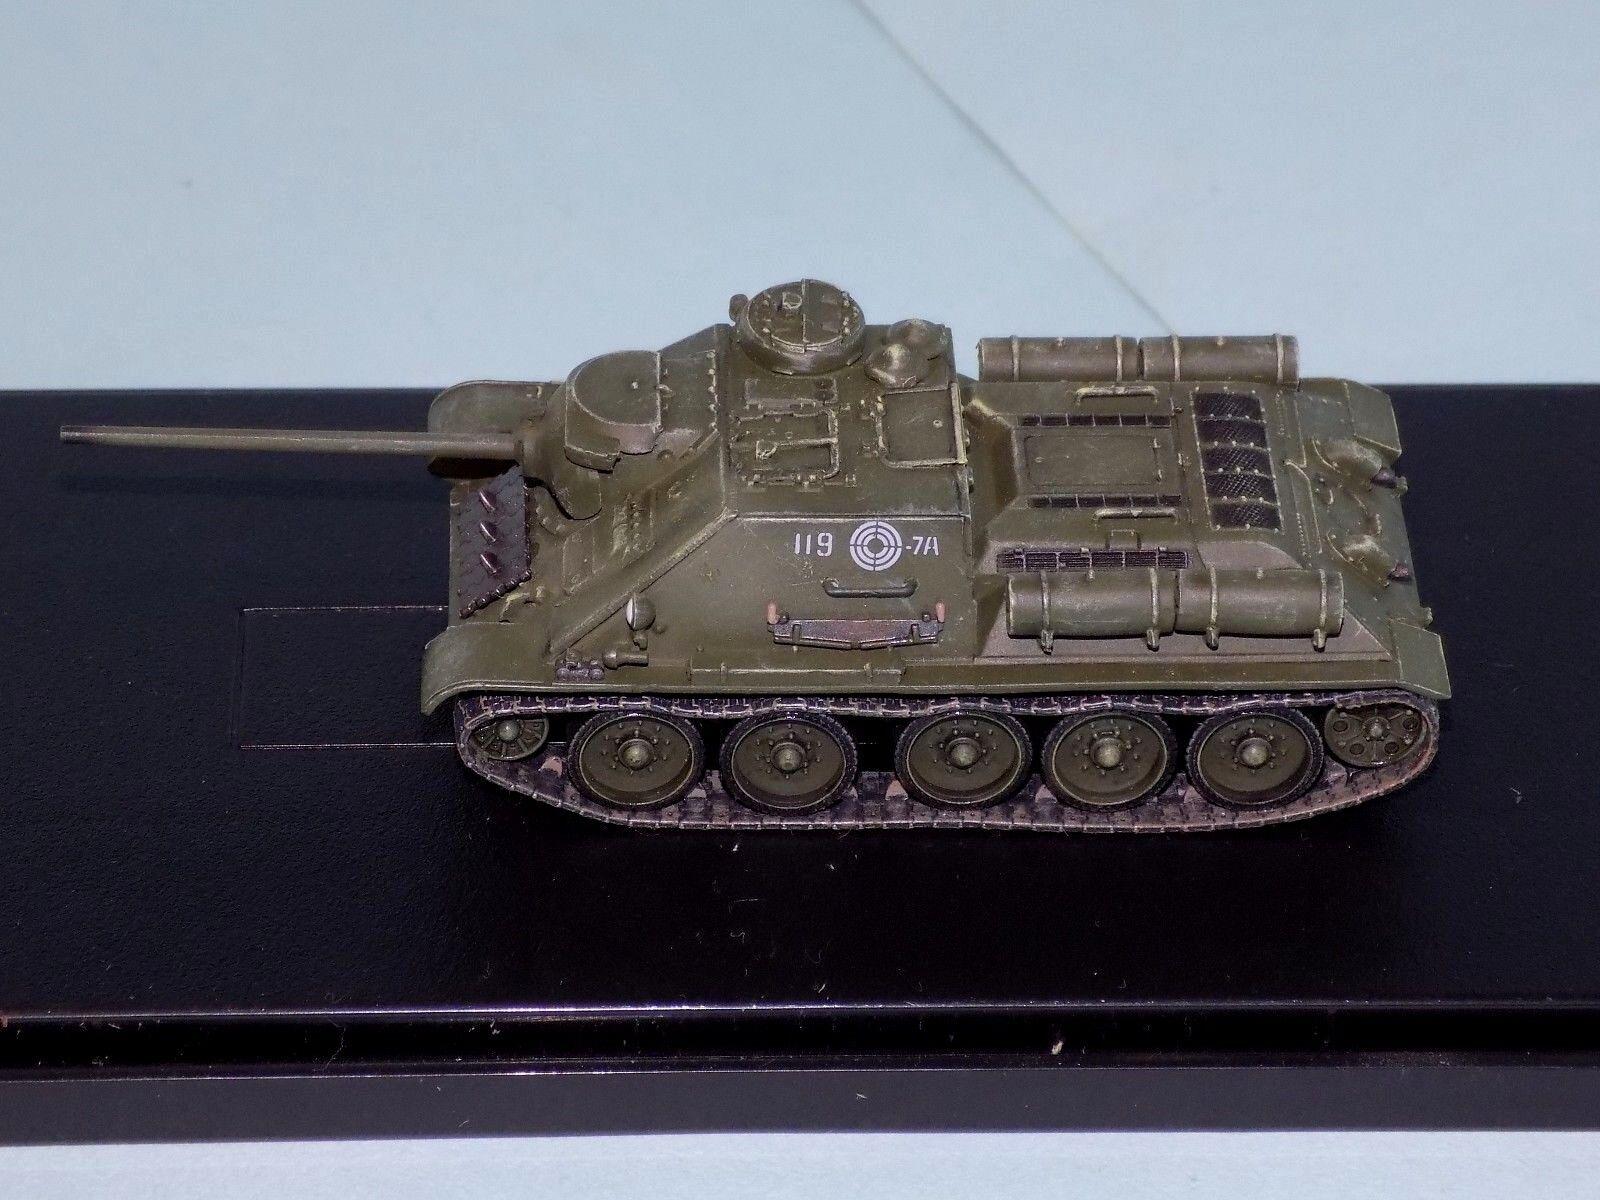 SU-85M Eastern Front 1945 DRAGON ARMOR 60091 1 72